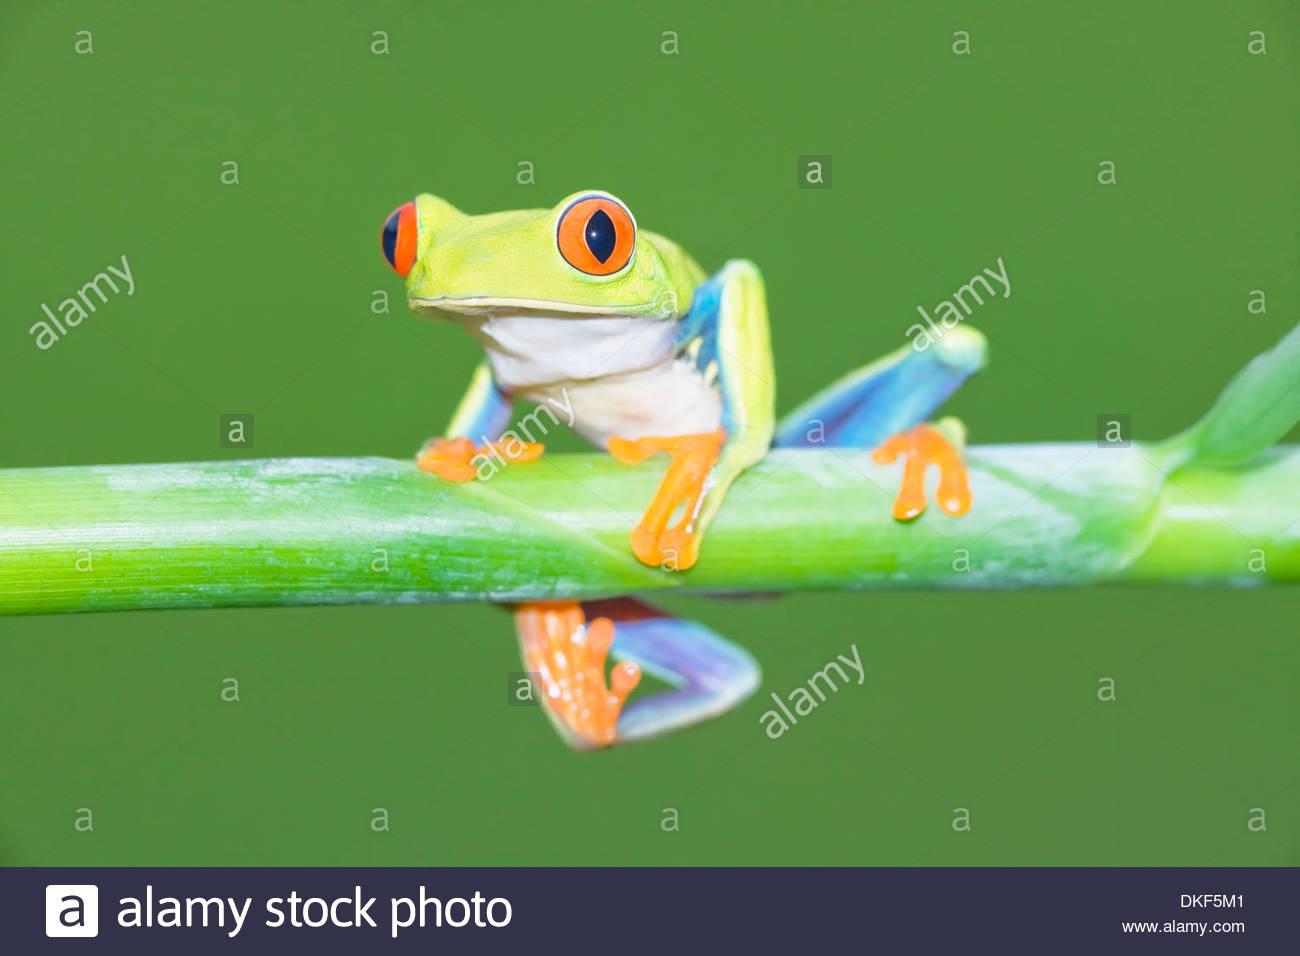 Red-eyed tree frog (Agalychnis Callidryas) on plant stem, Costa Rica Stock Photo